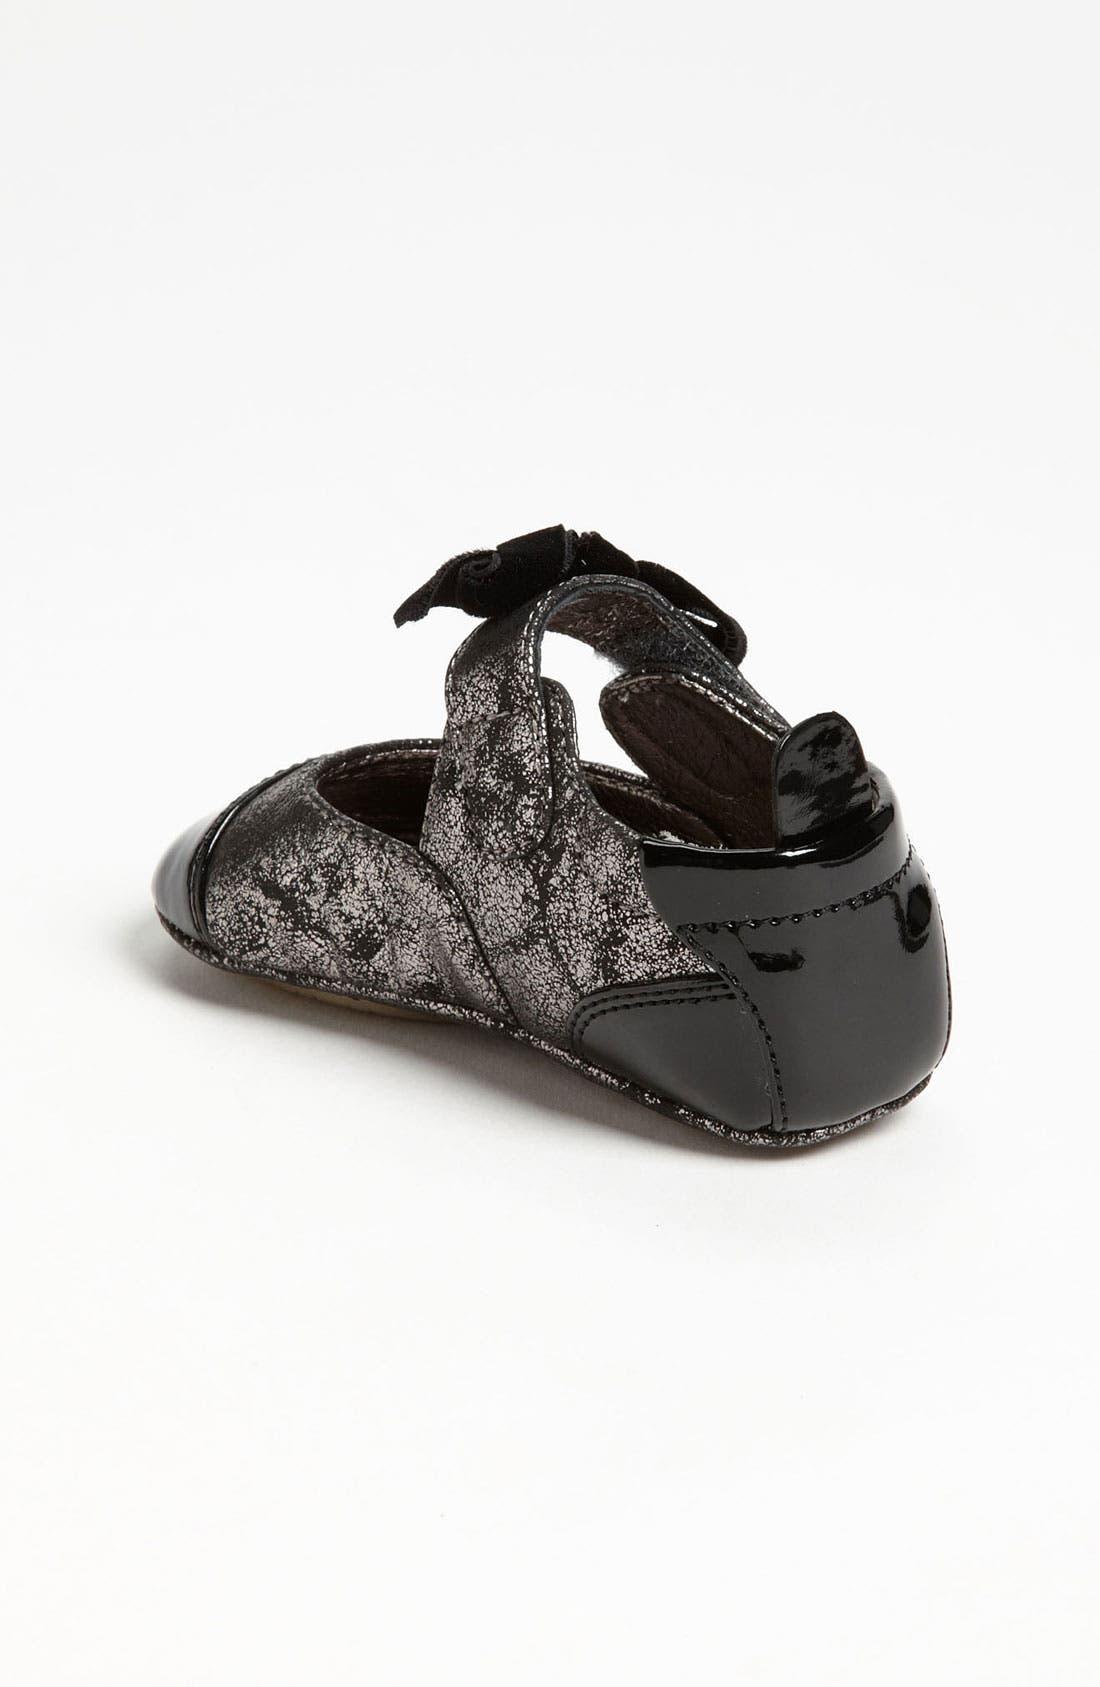 Alternate Image 2  - Cole Haan 'Mini Cap Toe' Leather Crib Shoe (Baby)